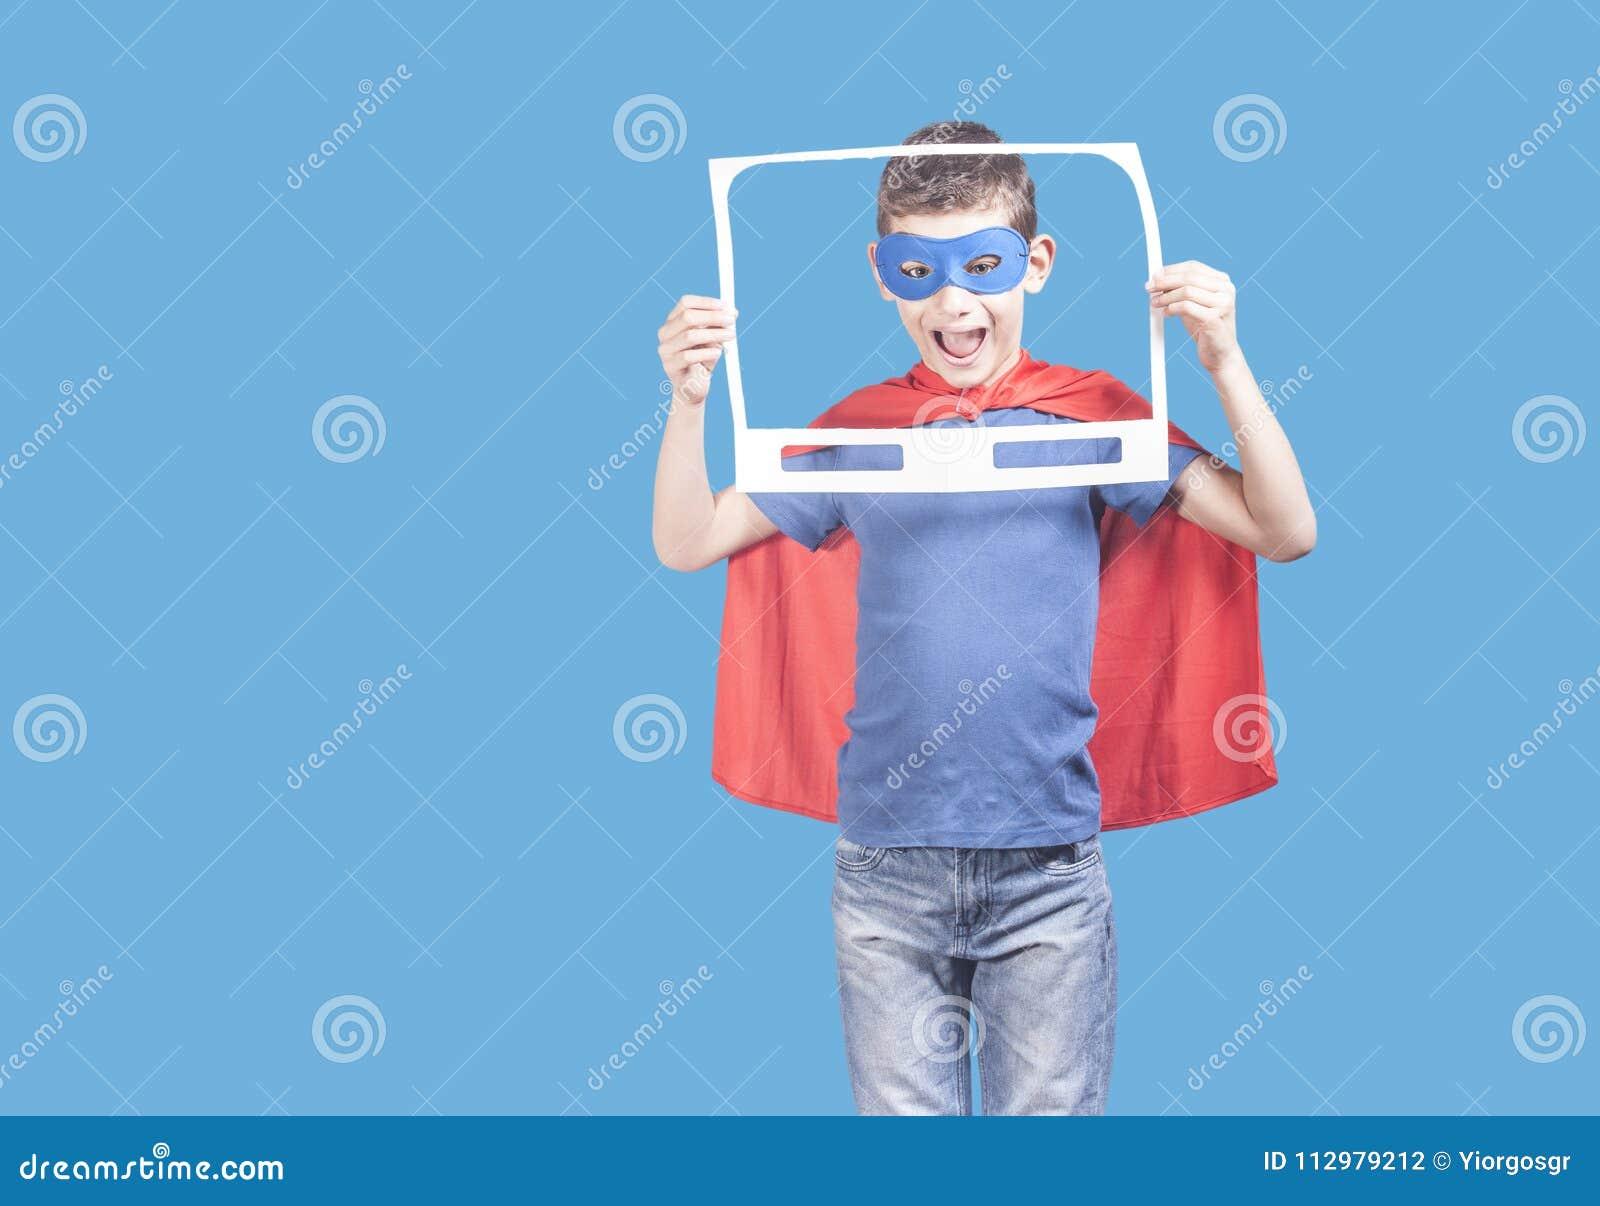 Super hero kid holding a paper TV frame